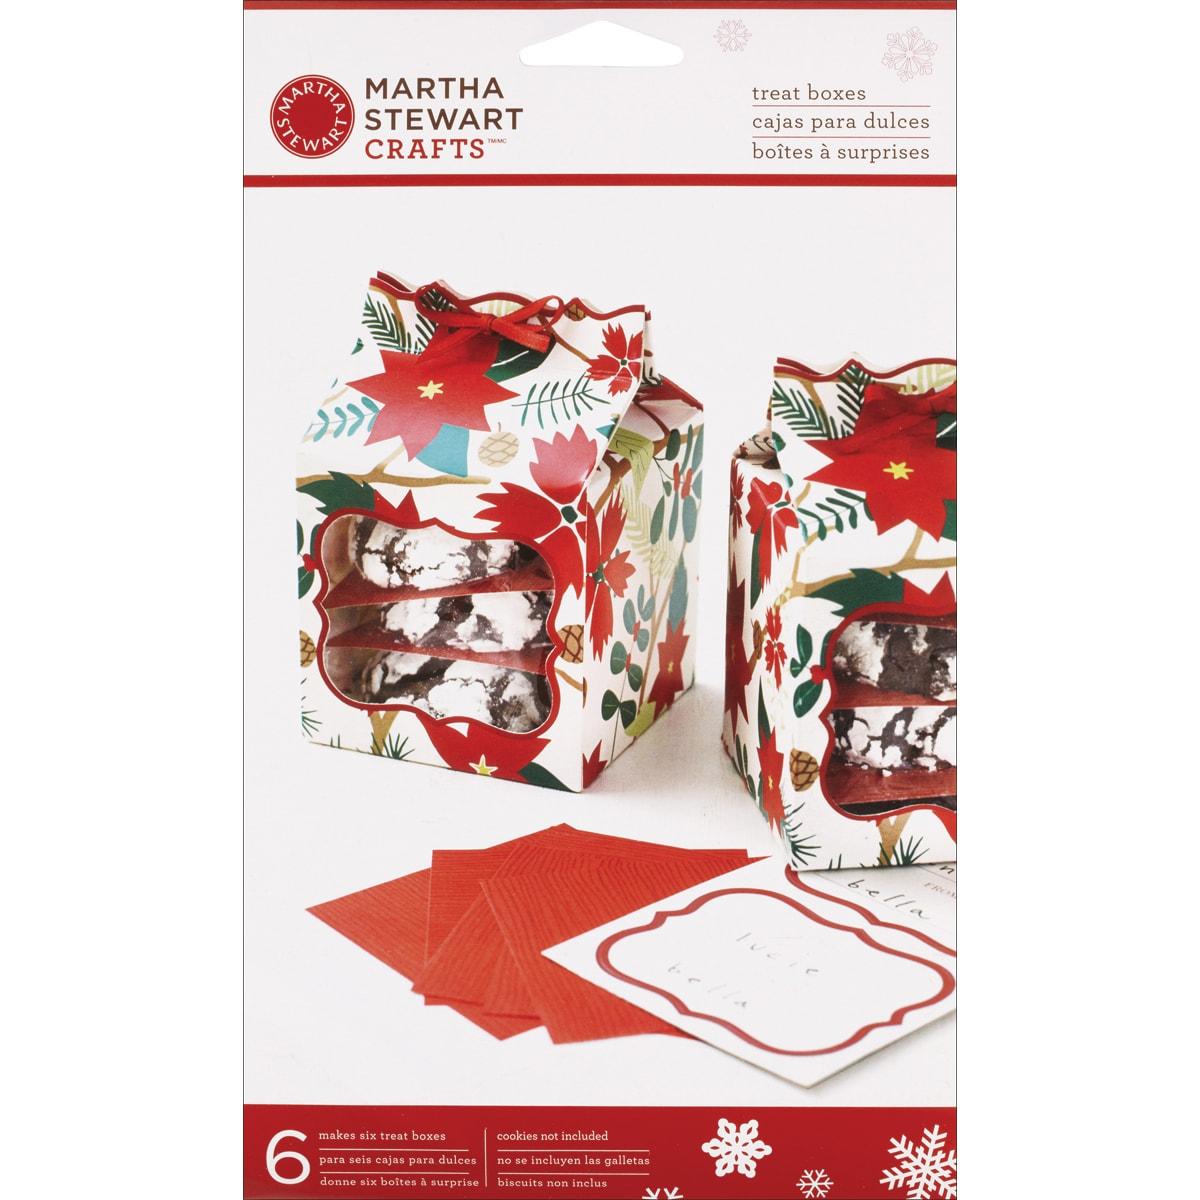 Martha Stewart Woodland Poinsettia 3x3-inch Treat Boxes (Pack of 6)